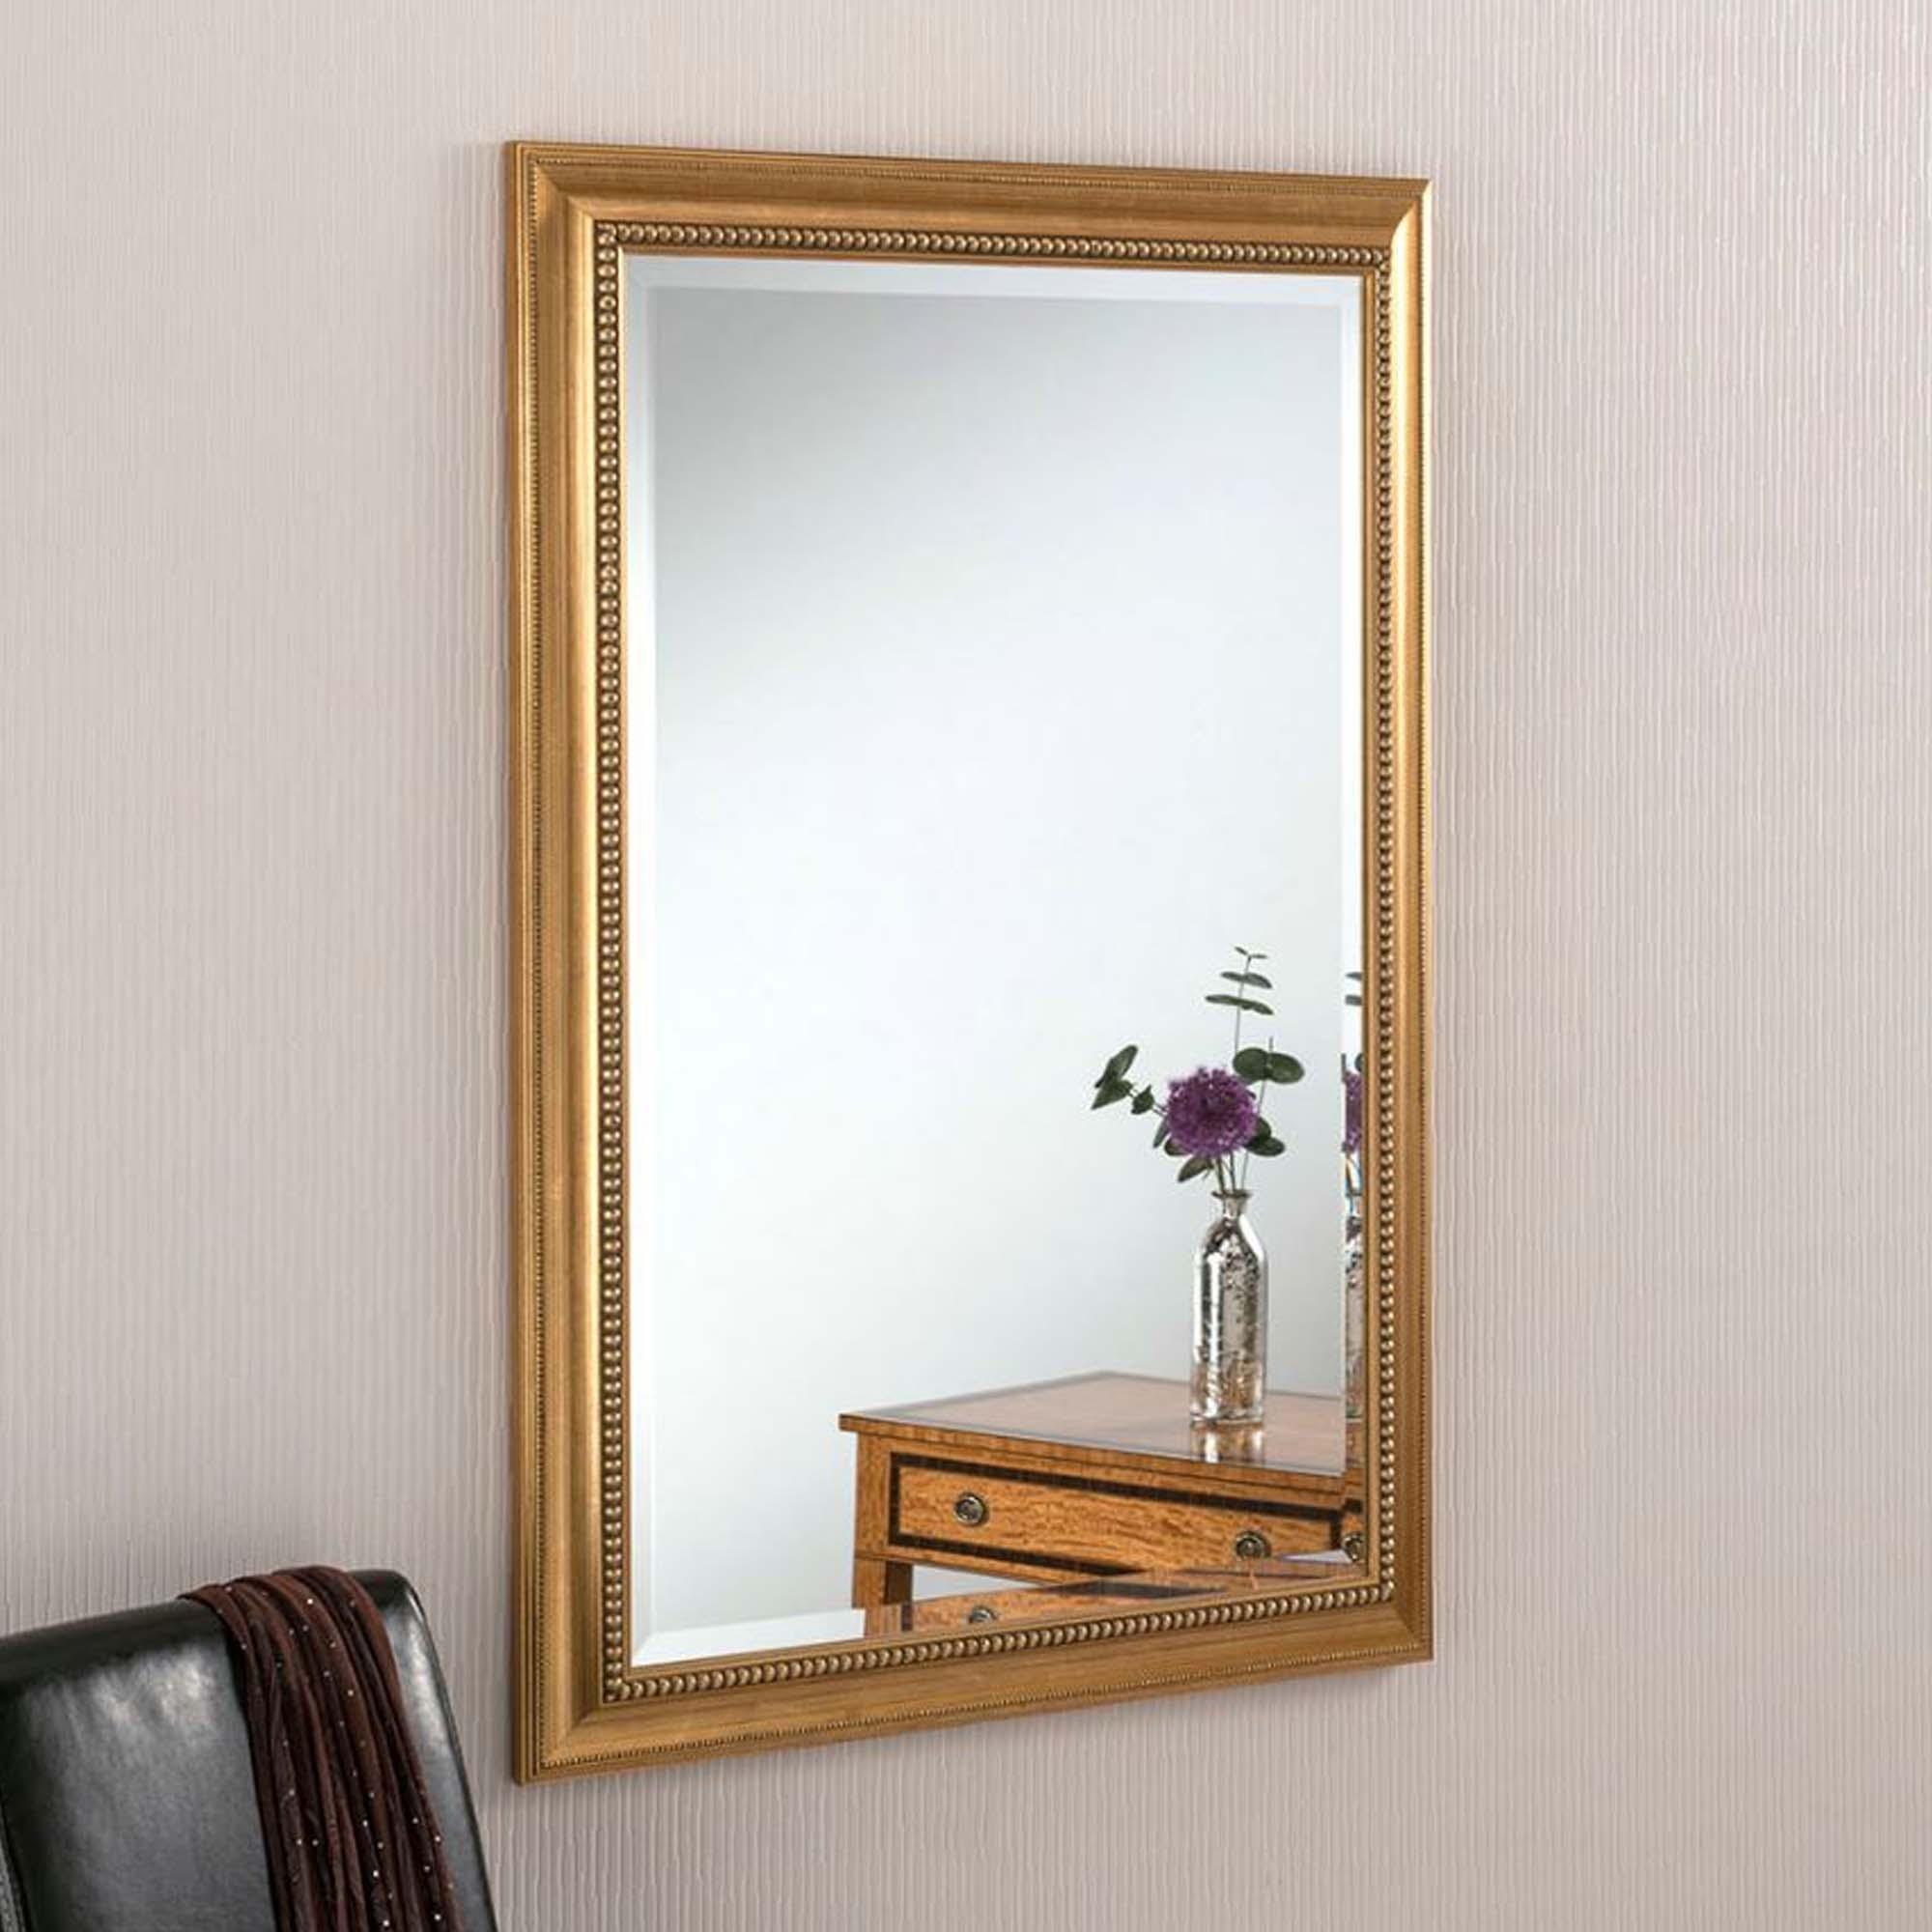 Ornate Gold Beaded Rectangular Wall Mirror | Decor ... on Wall Mirrors id=26840